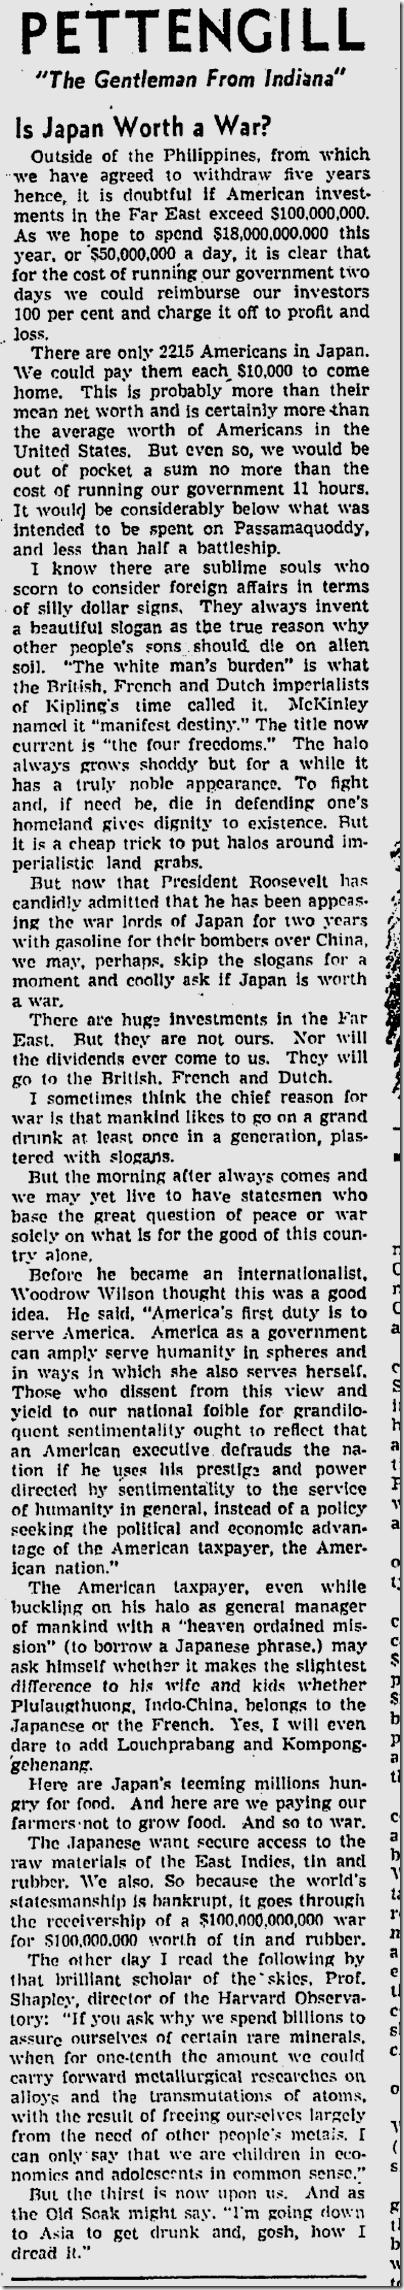 Aug. 11, 1941, Pettengill